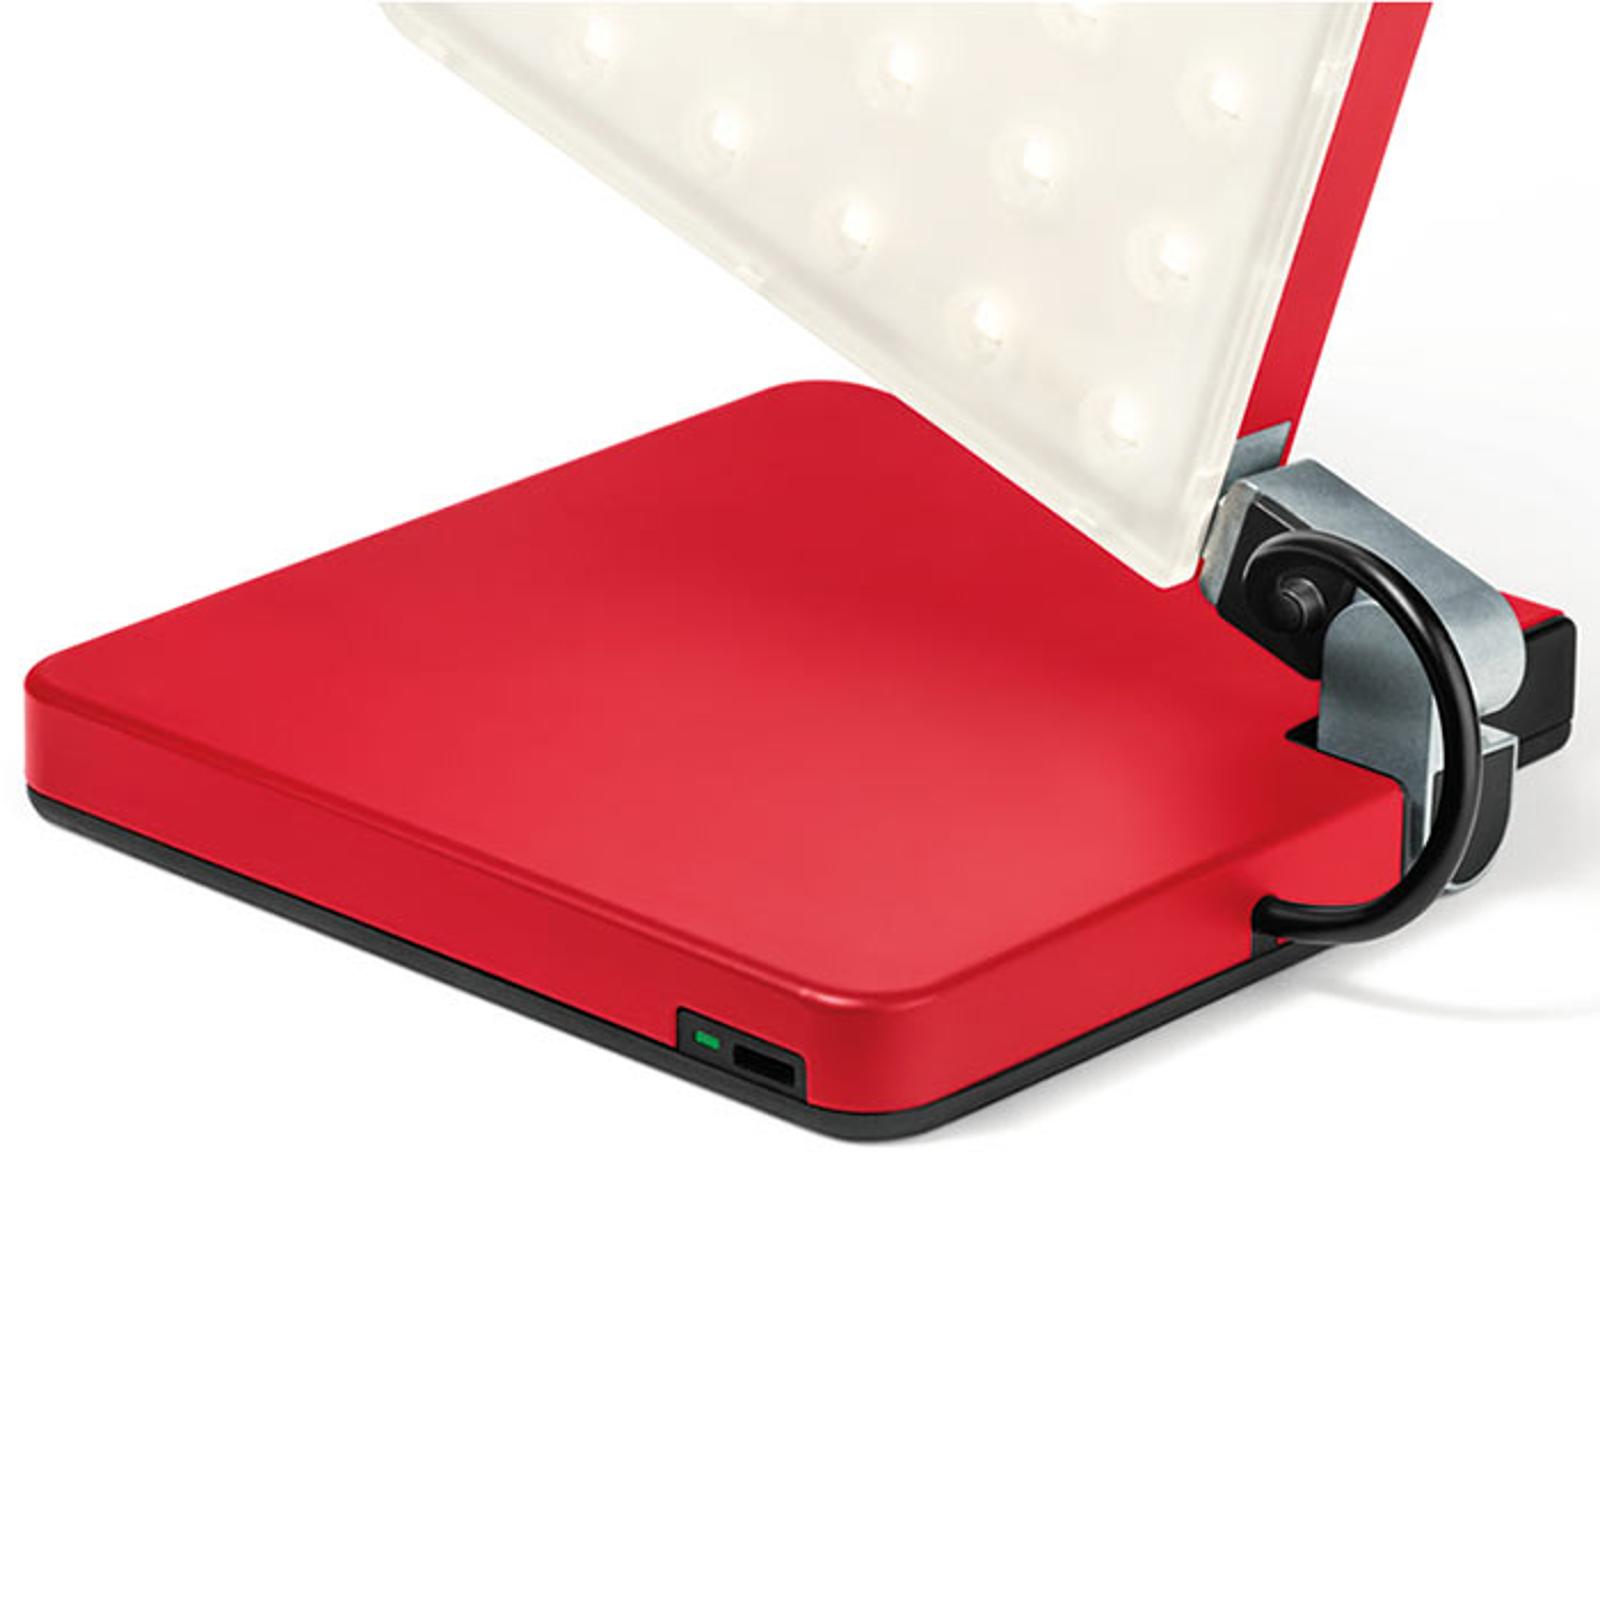 Nimbus Roxxane Fly LED tafellamp, rood